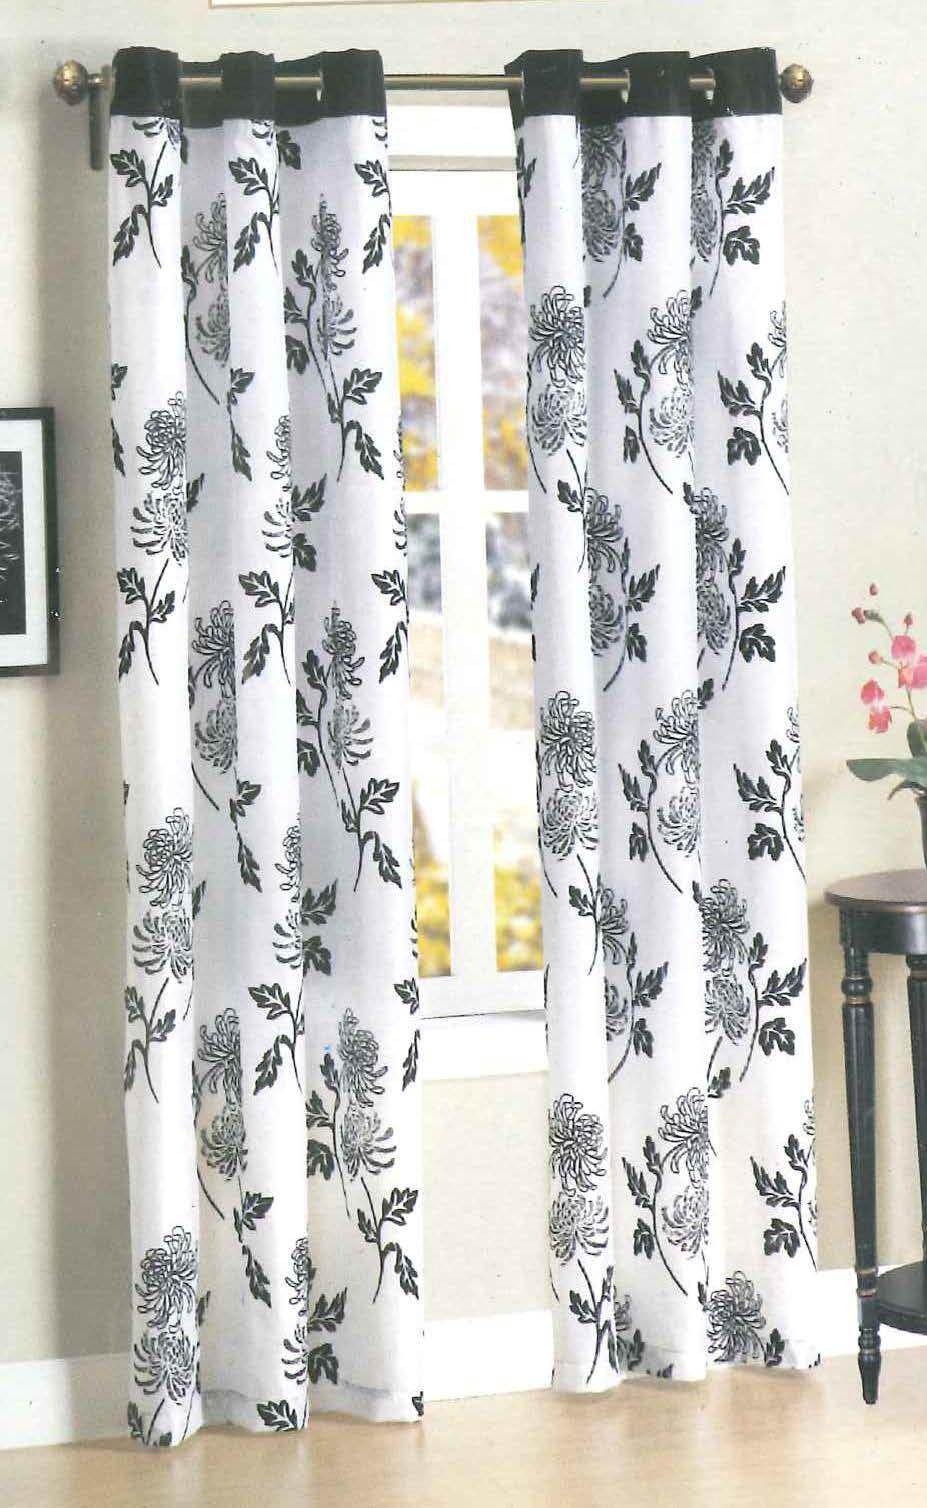 Curtains For Sarah S Room Curtains Dollar Store Decor Family